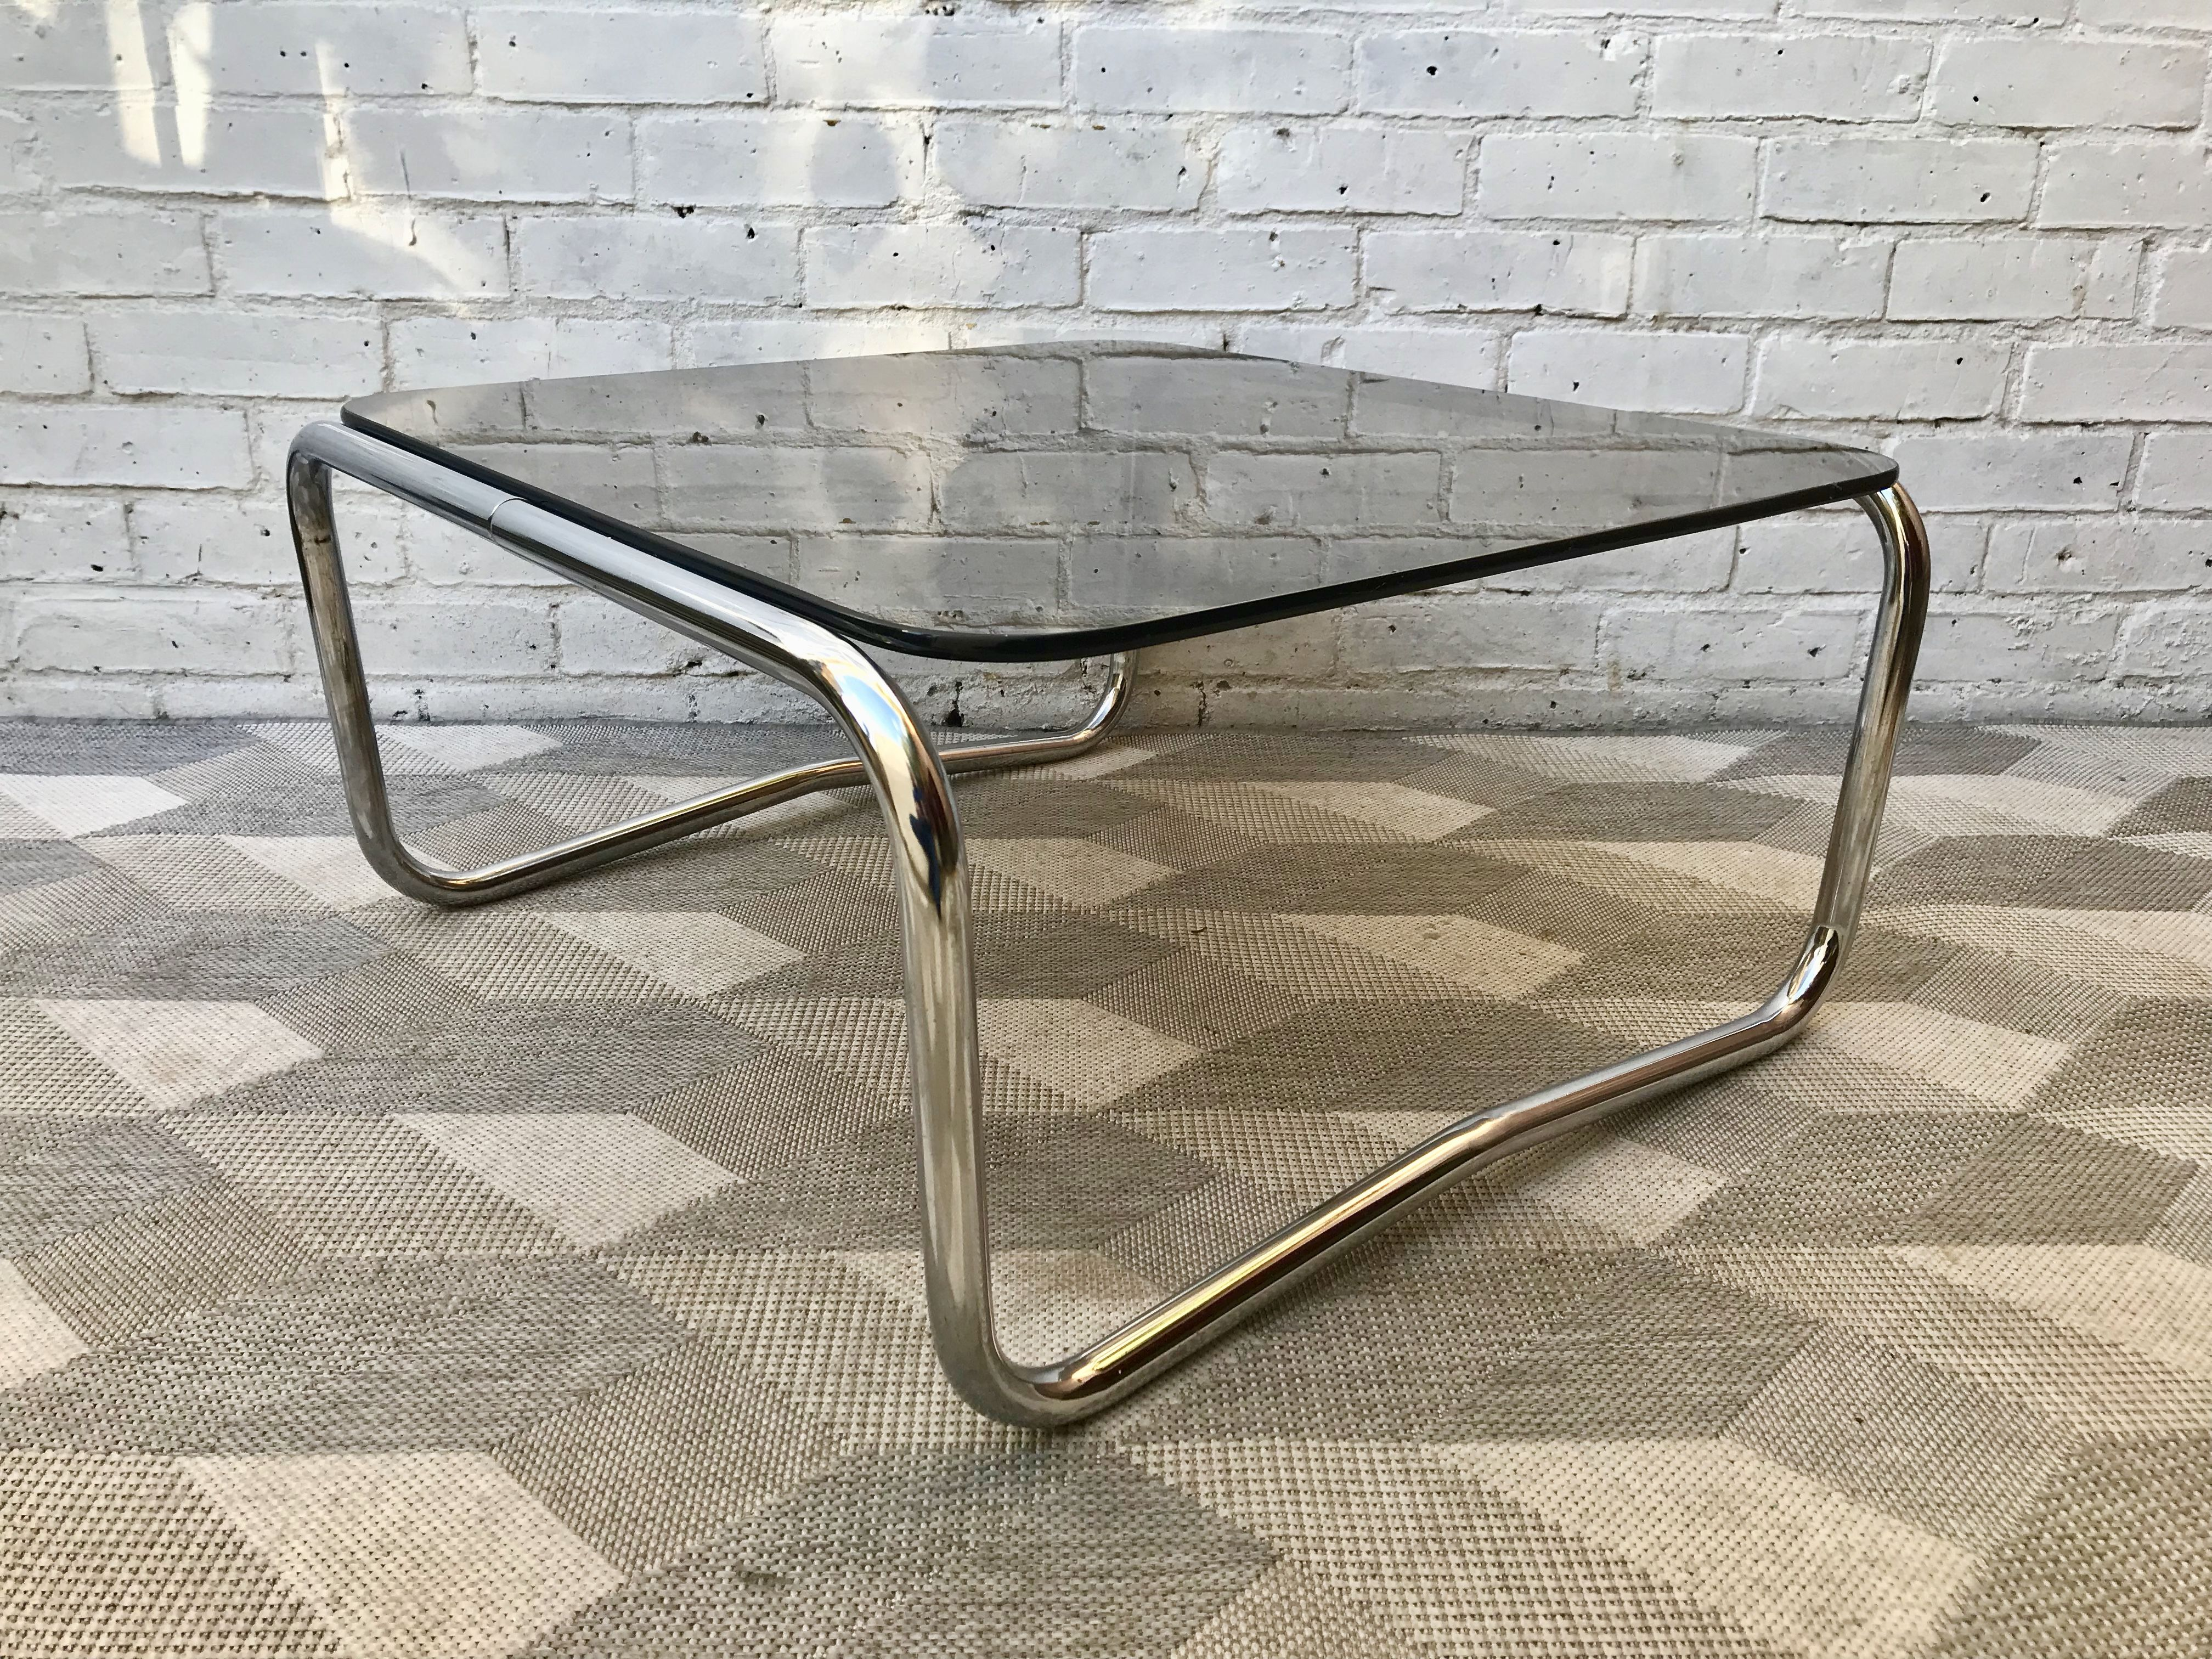 Vintage Glass Chrome Square Coffee Table #891 | DBD Coffee ...